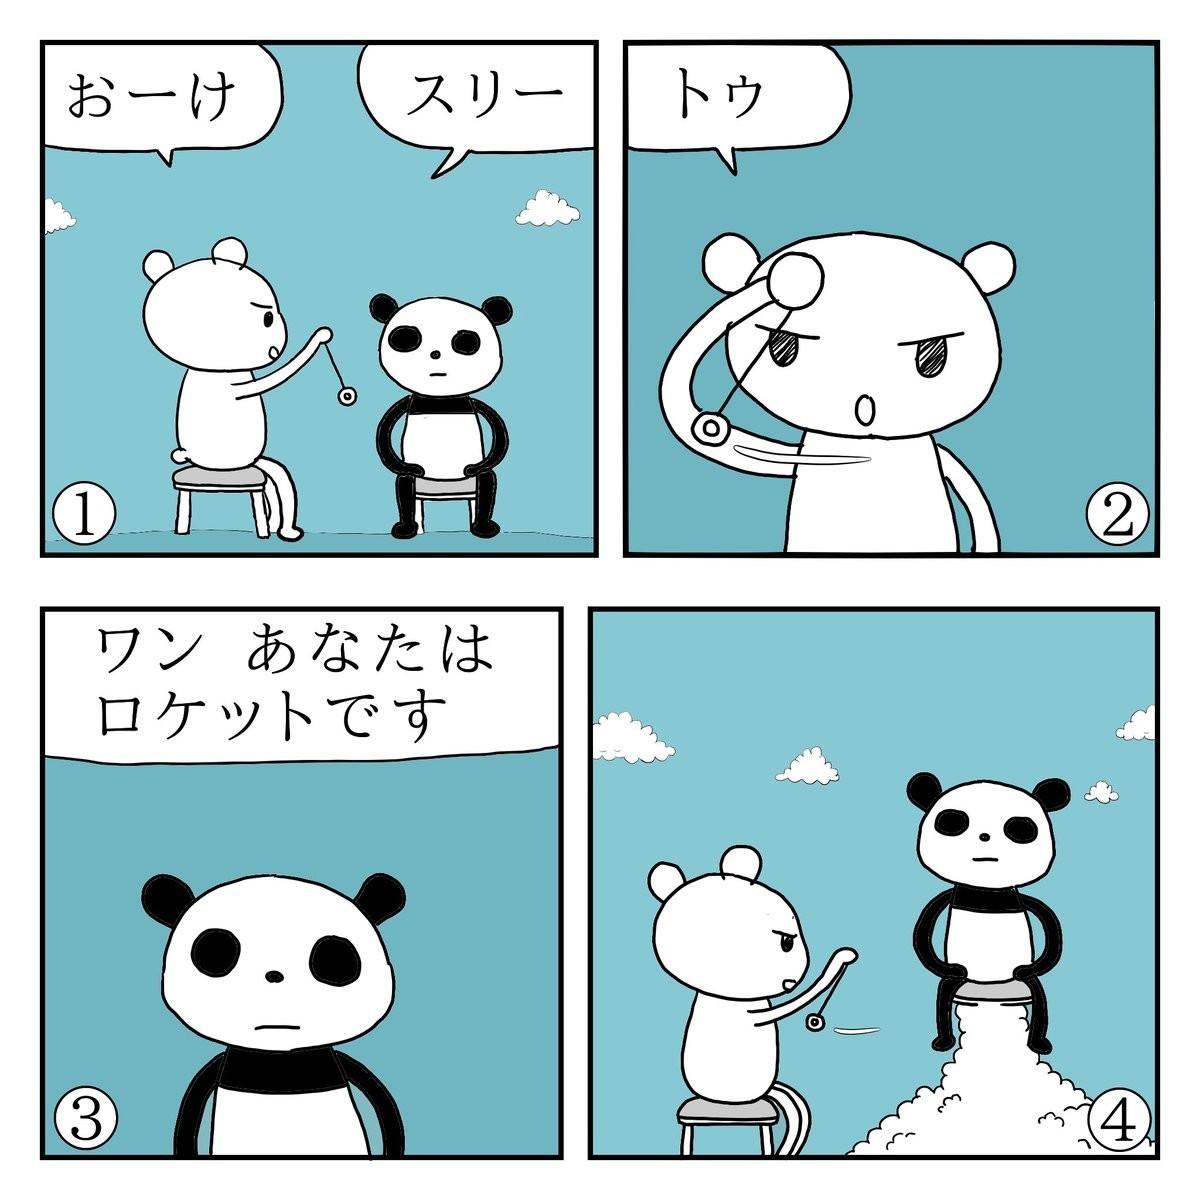 f:id:kanarihikokuma:20190321091309j:image:w330